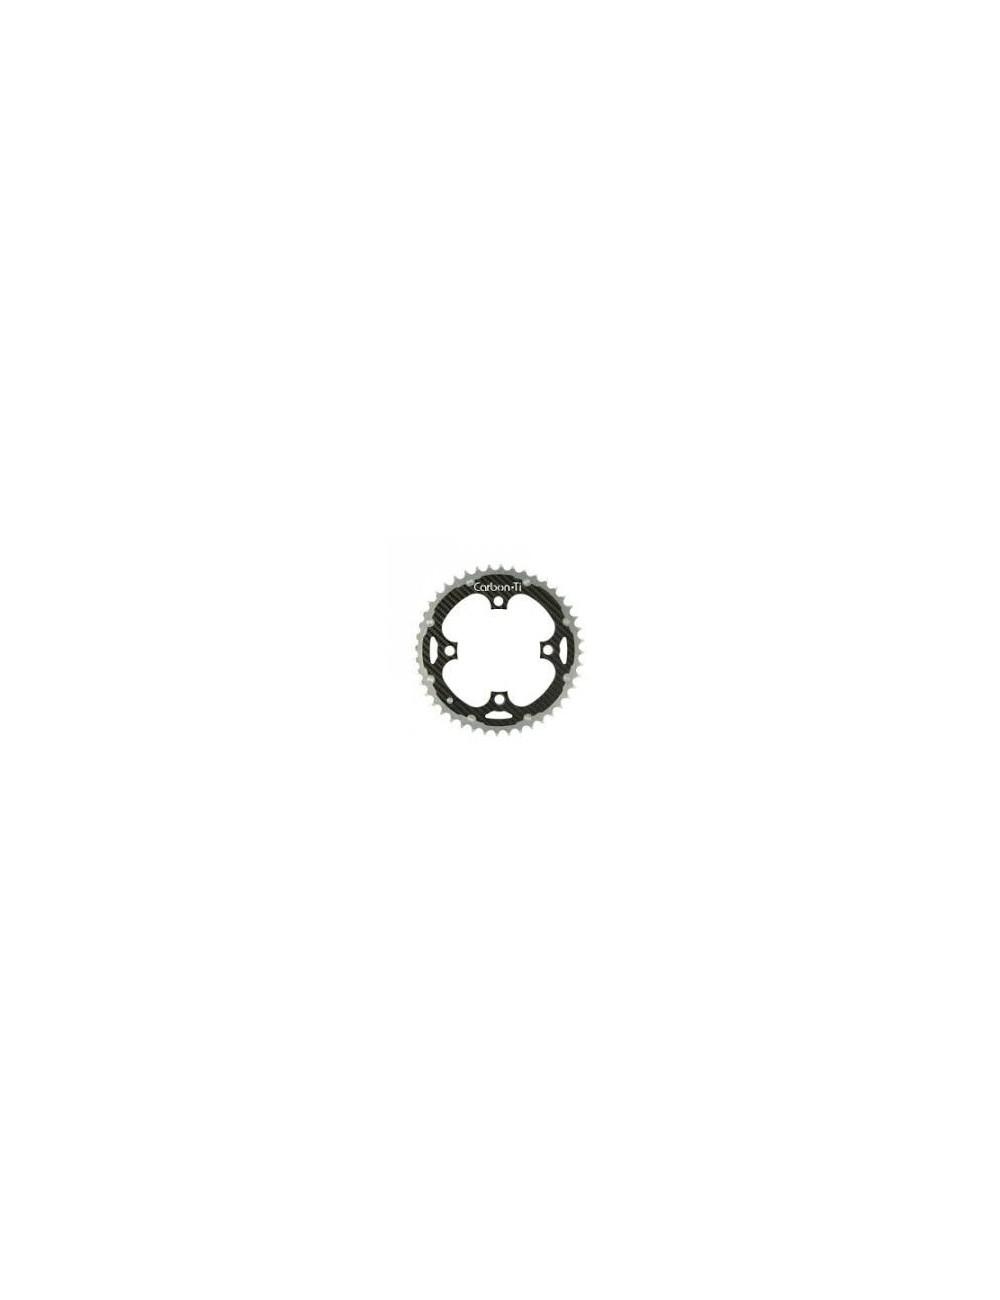 RODA PEDALEIRA X-RING TI/CARBONO MTB 4X104 32D 31GR